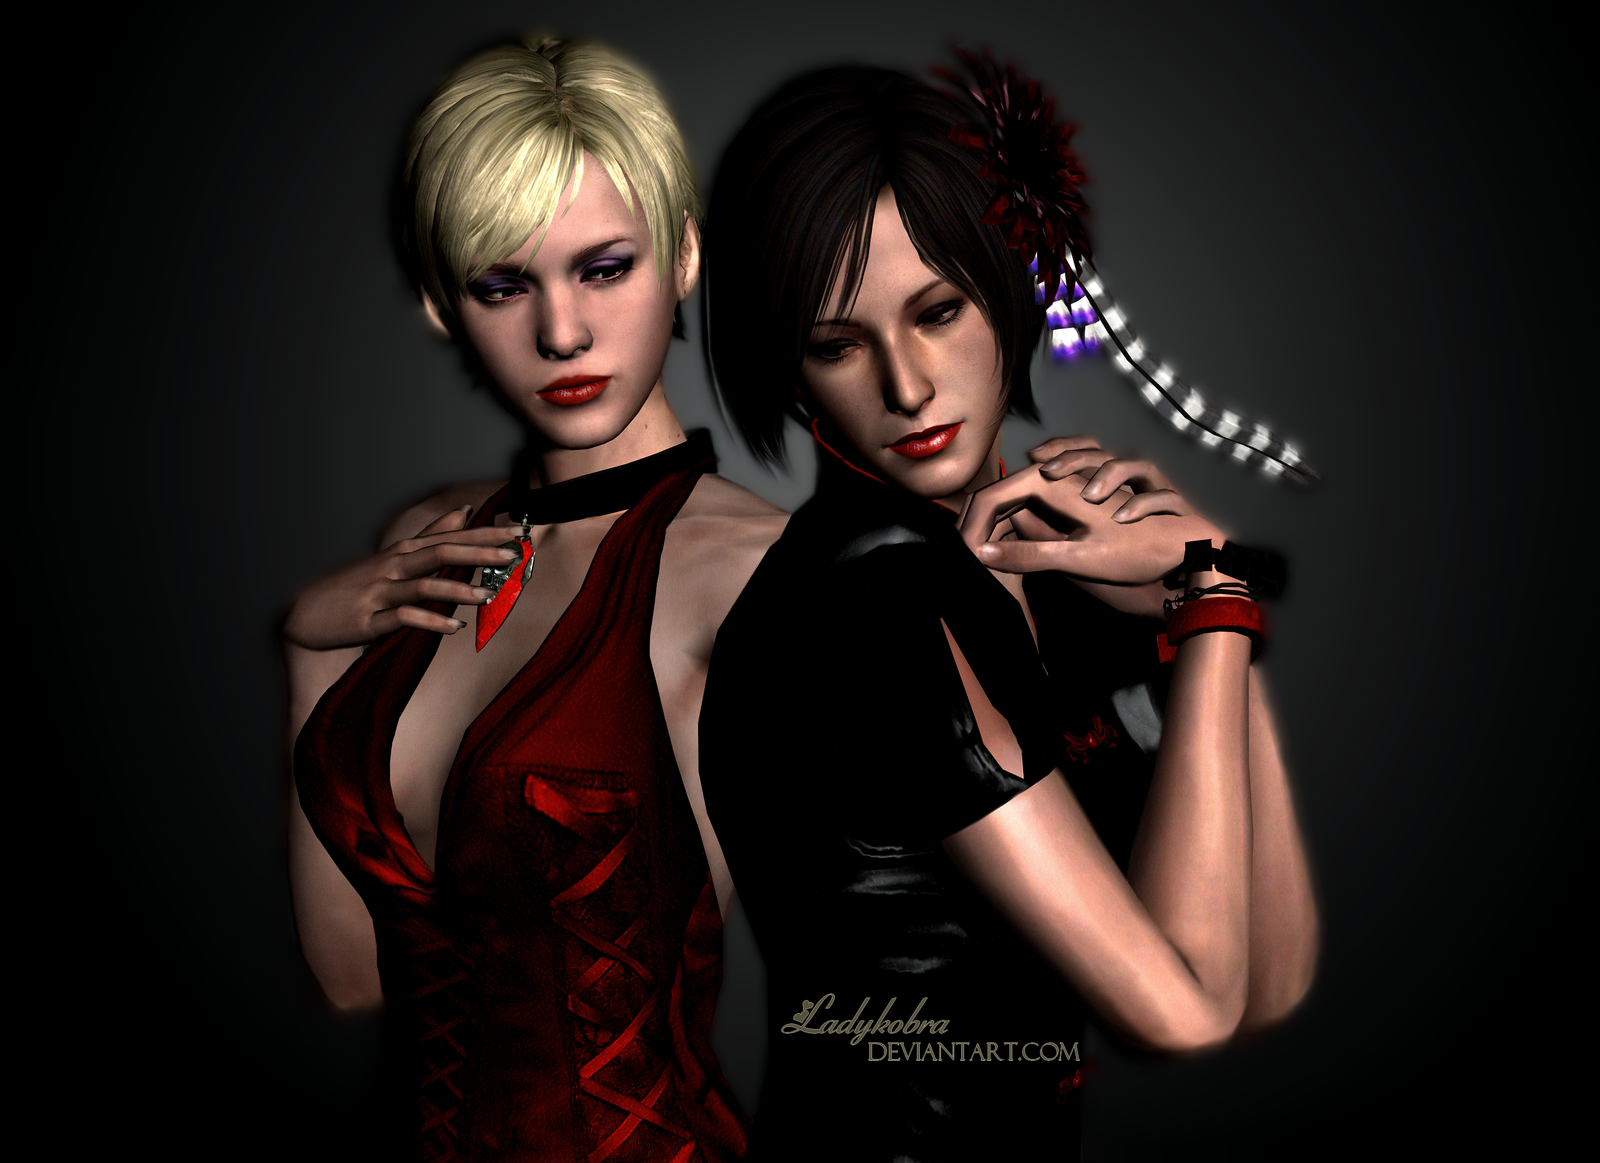 ~ S E N S U A L I T Y ~ by ladykobra